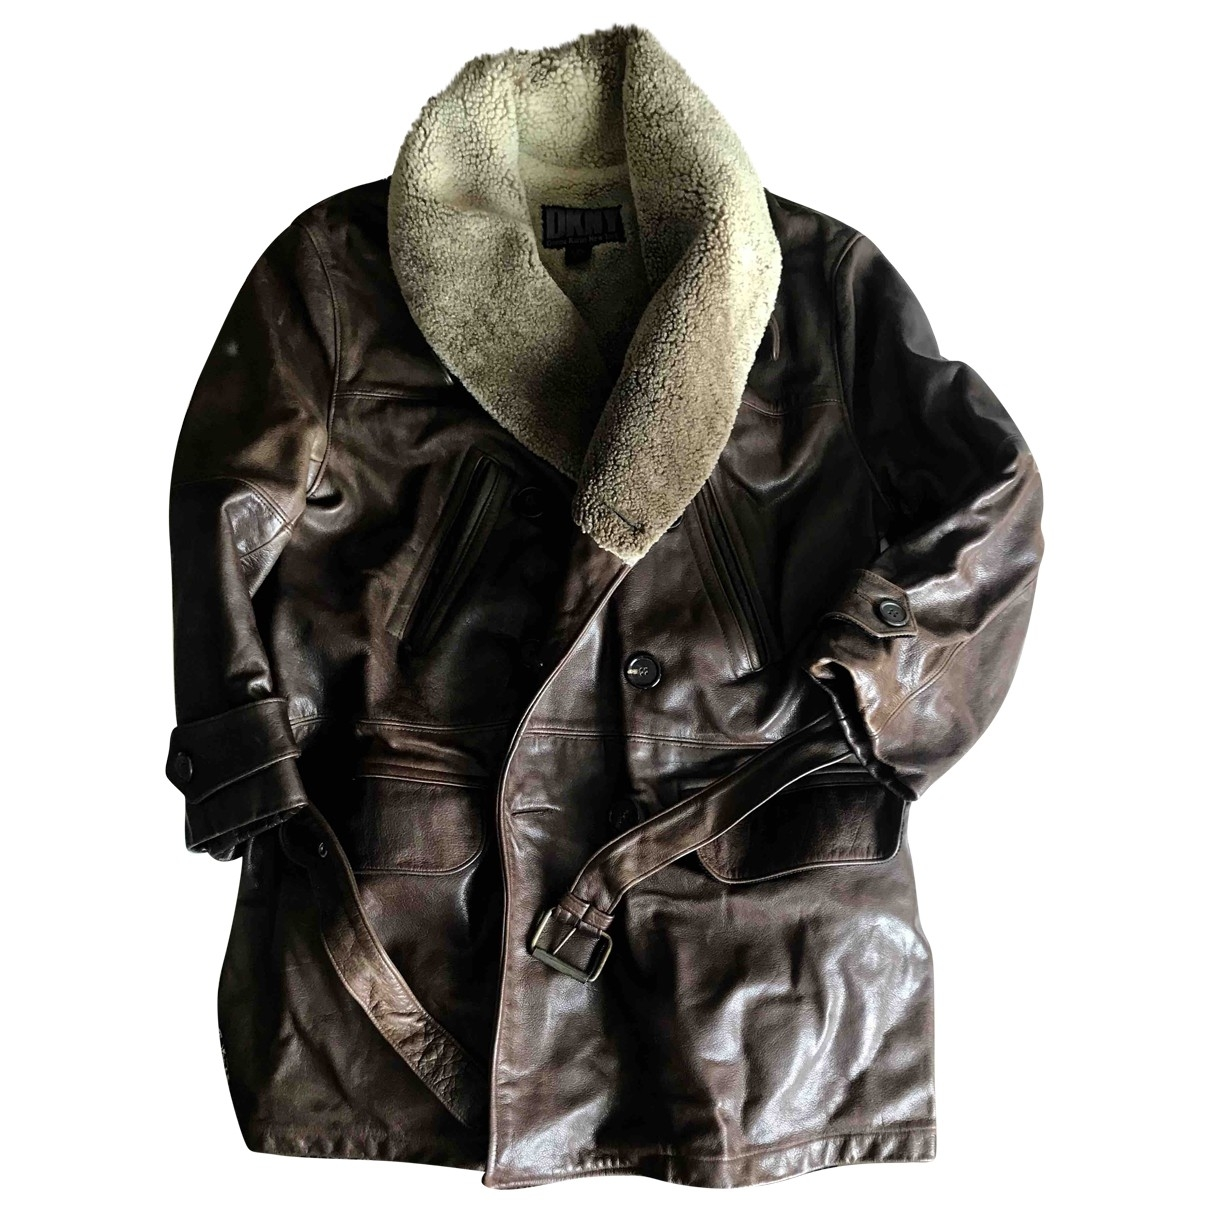 Dkny \N Brown Leather jacket  for Men M International